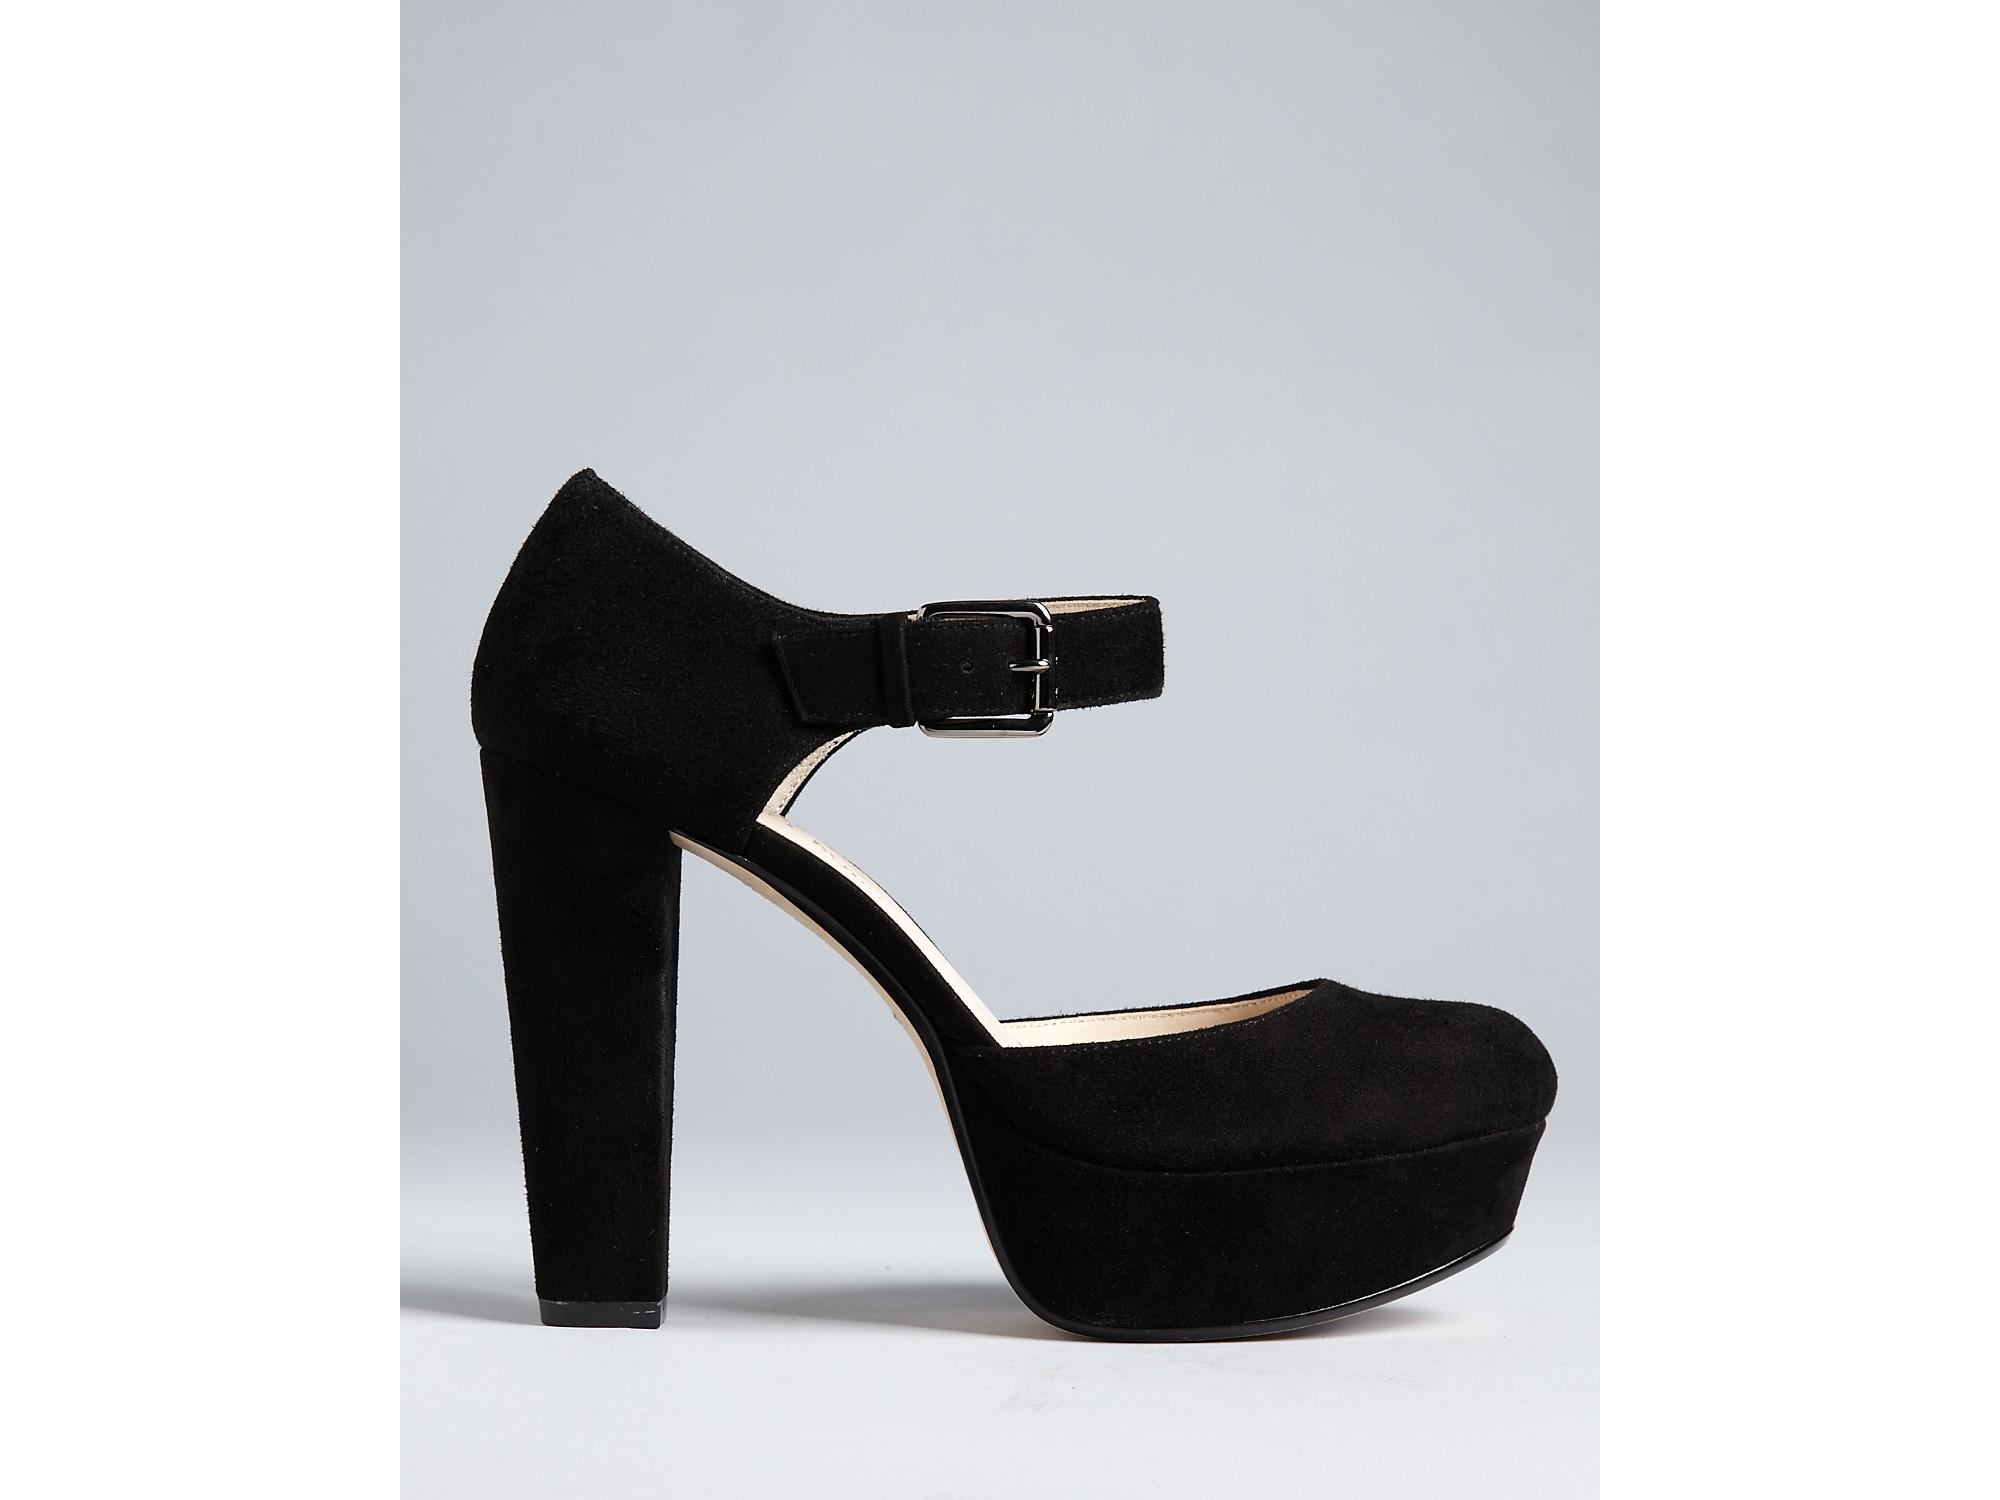 michael kors kors pumps kempton high heel in black lyst. Black Bedroom Furniture Sets. Home Design Ideas